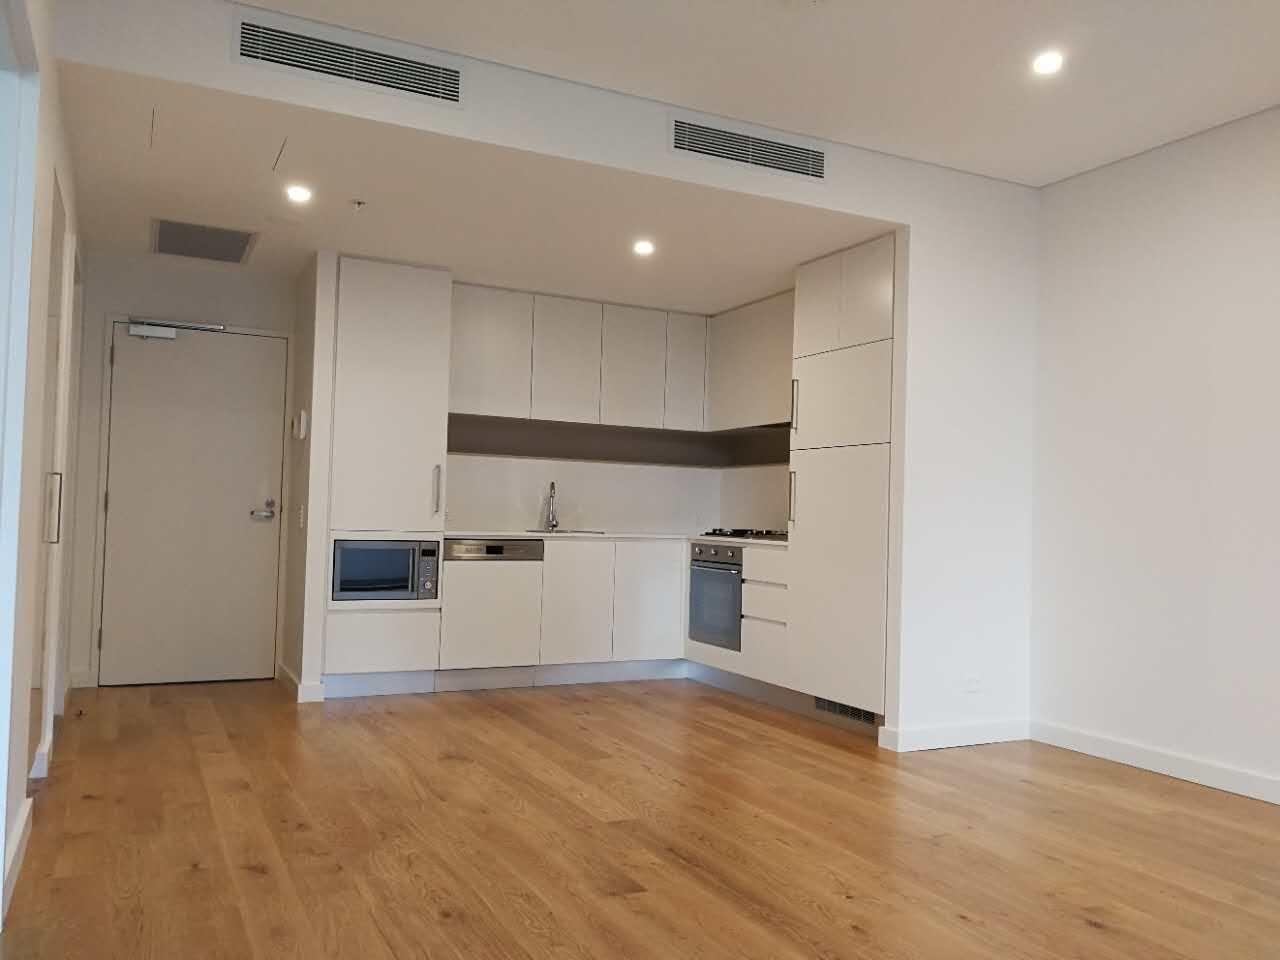 507/7 Mooltan Avenue, Macquarie Park NSW 2113, Image 0